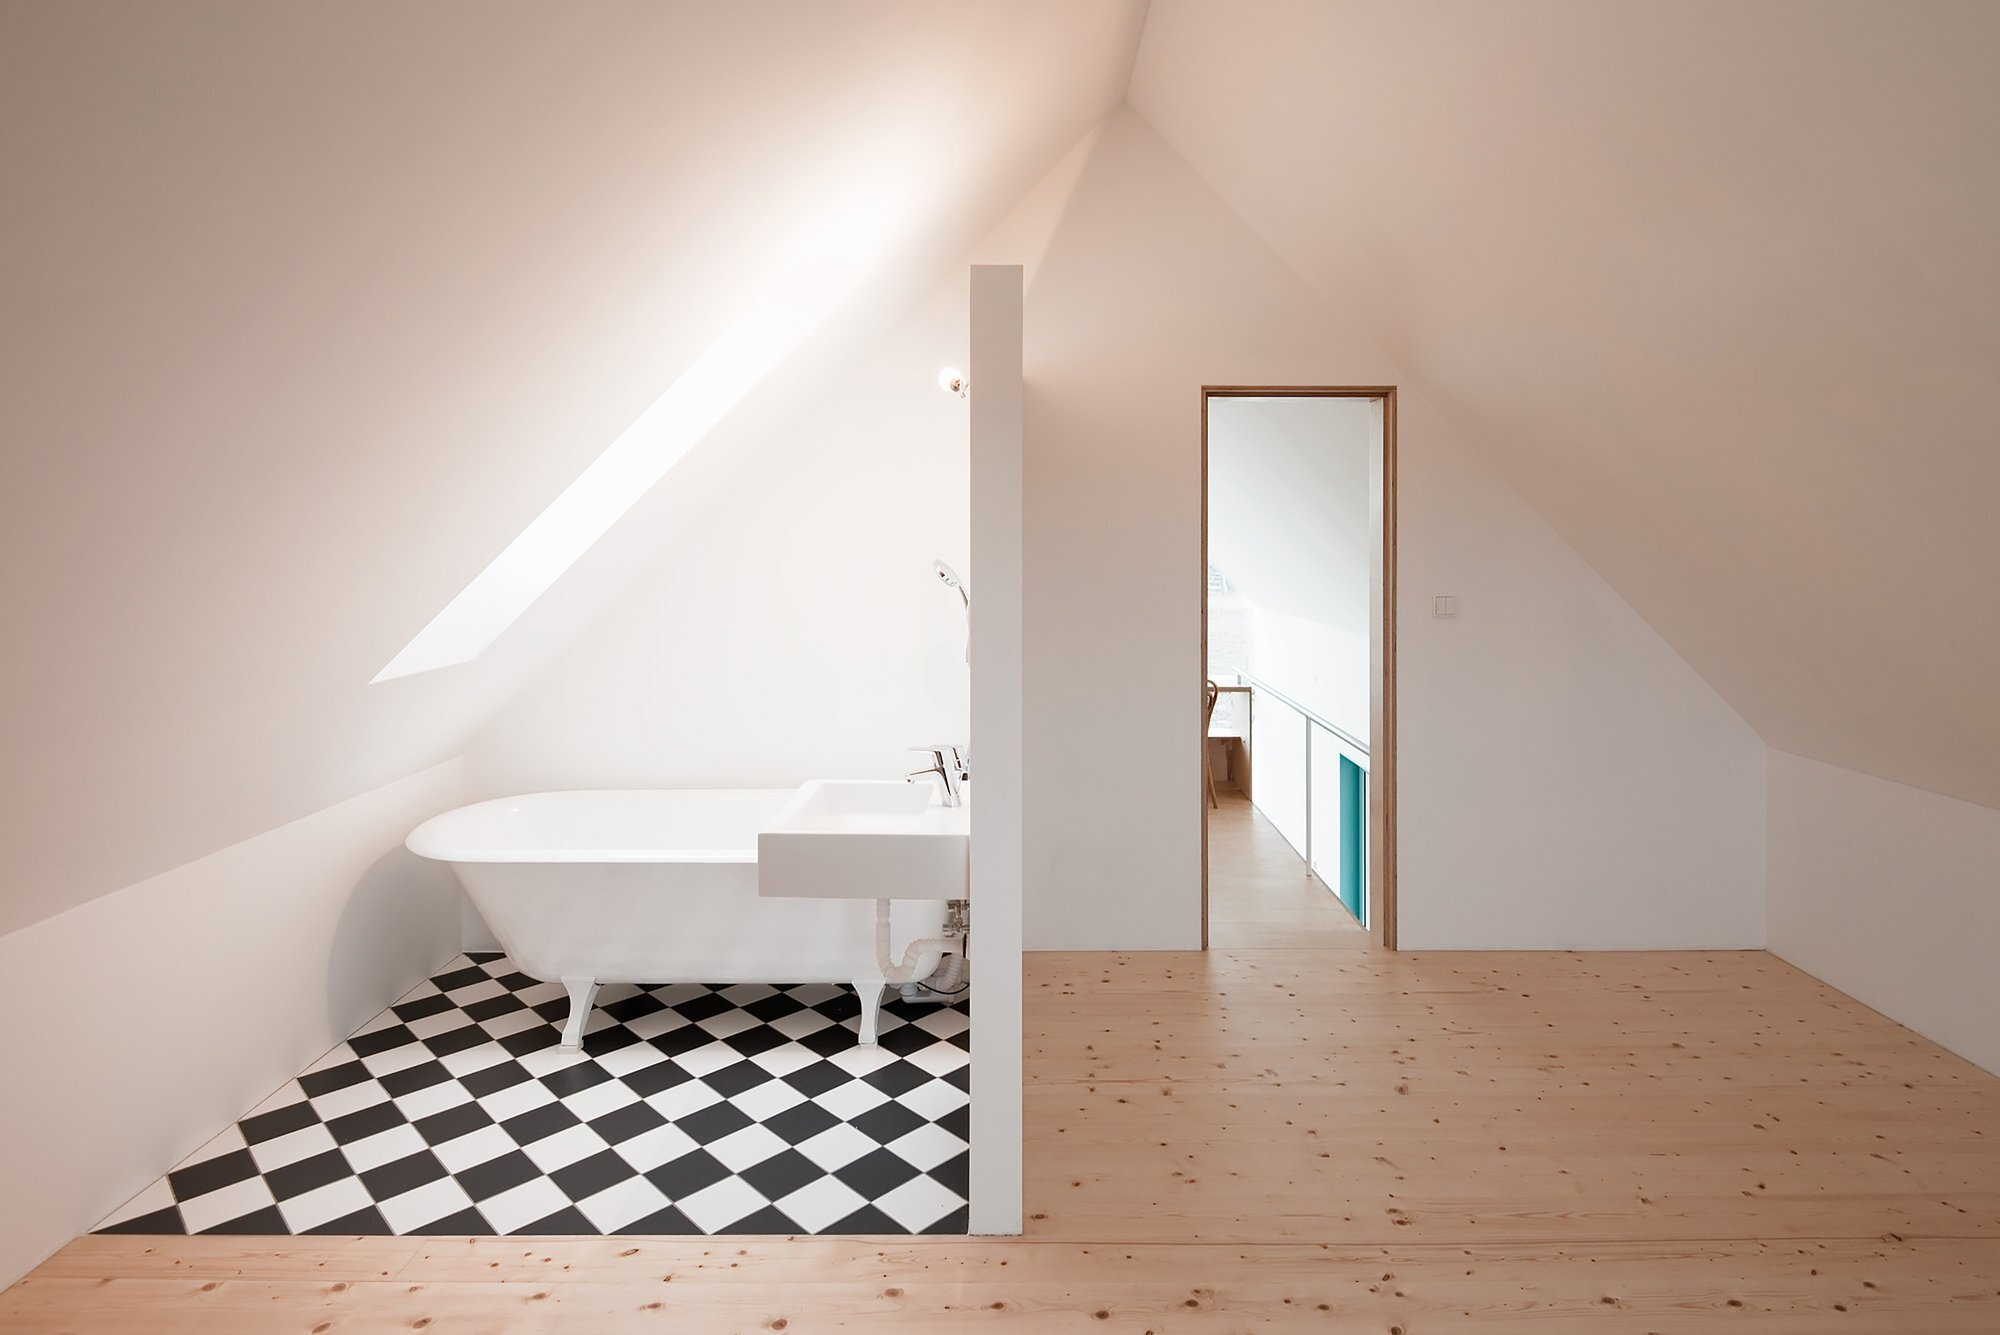 IST-Family House - JRKVC - Slovakia - Small House - Bathroom - Humble Homes